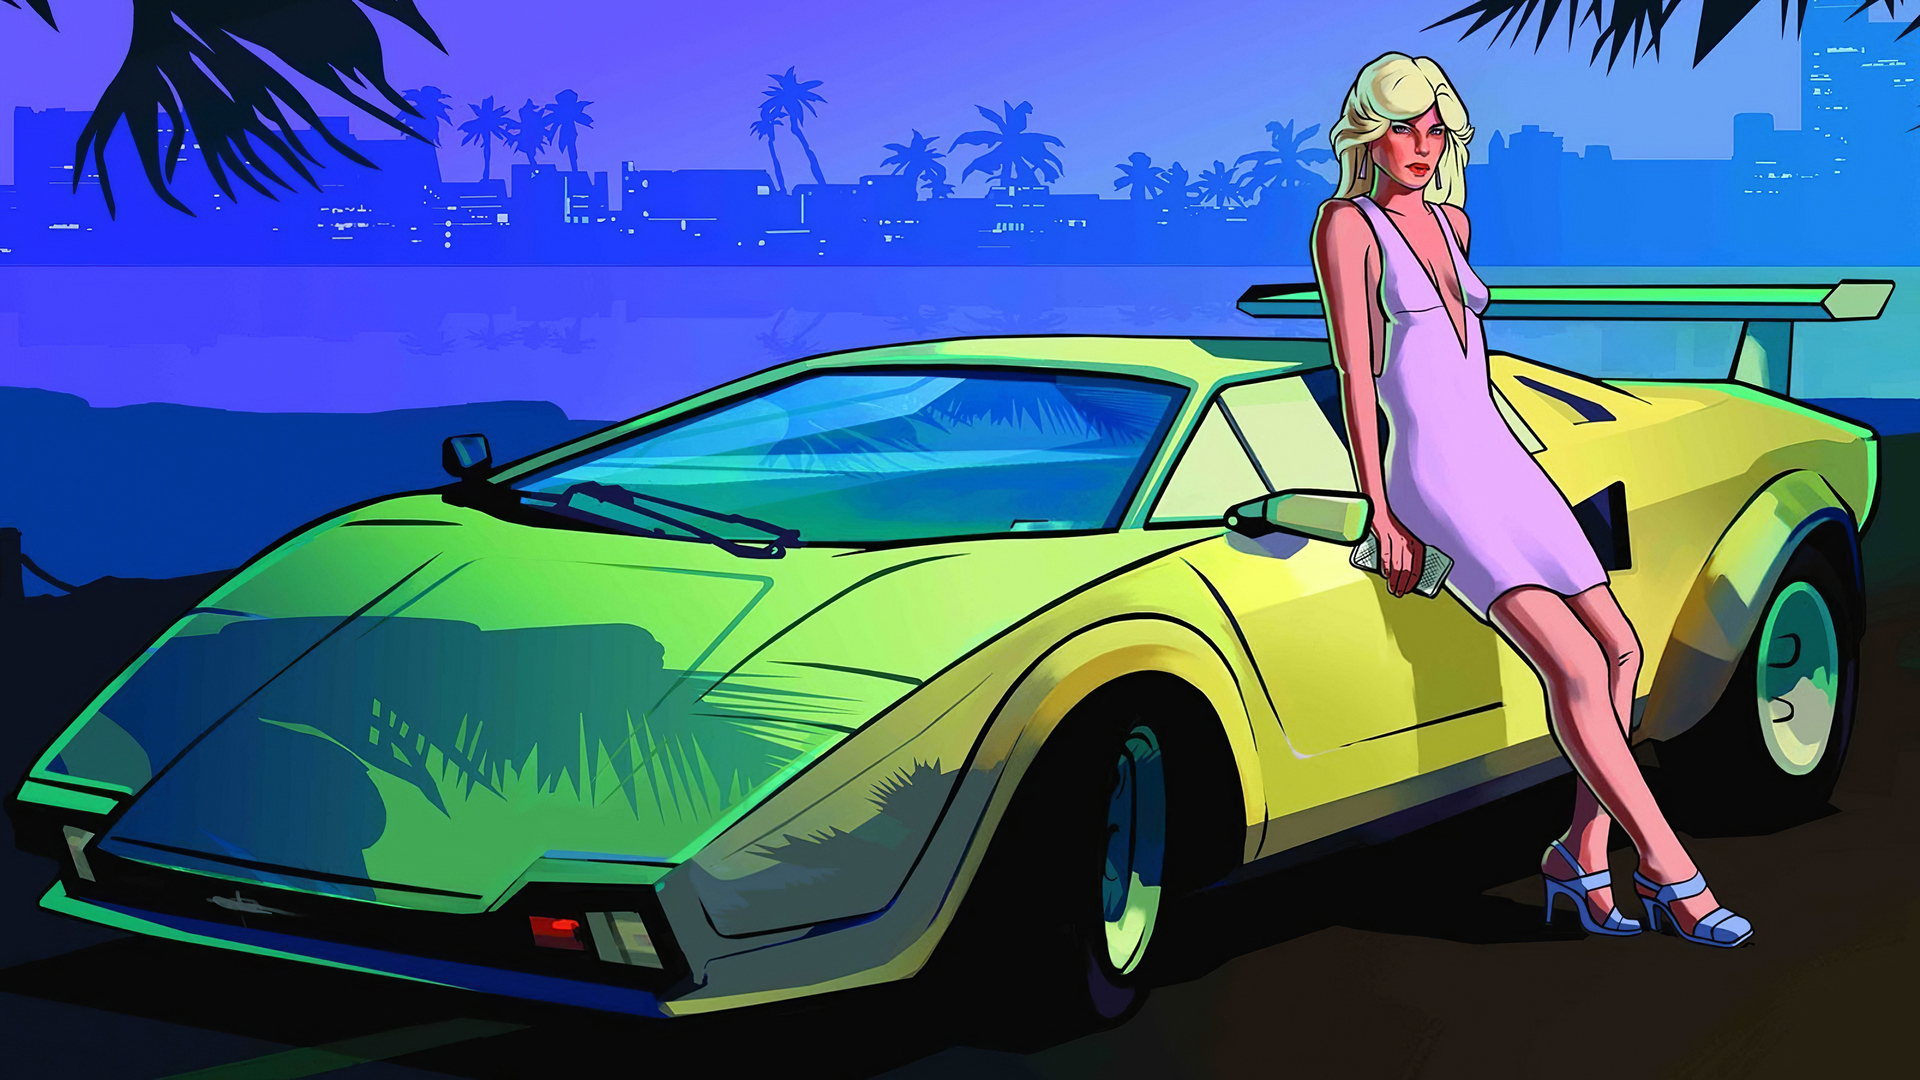 1920x1080 Women Luxury Grand Theft Auto Vice City 4k Laptop Full